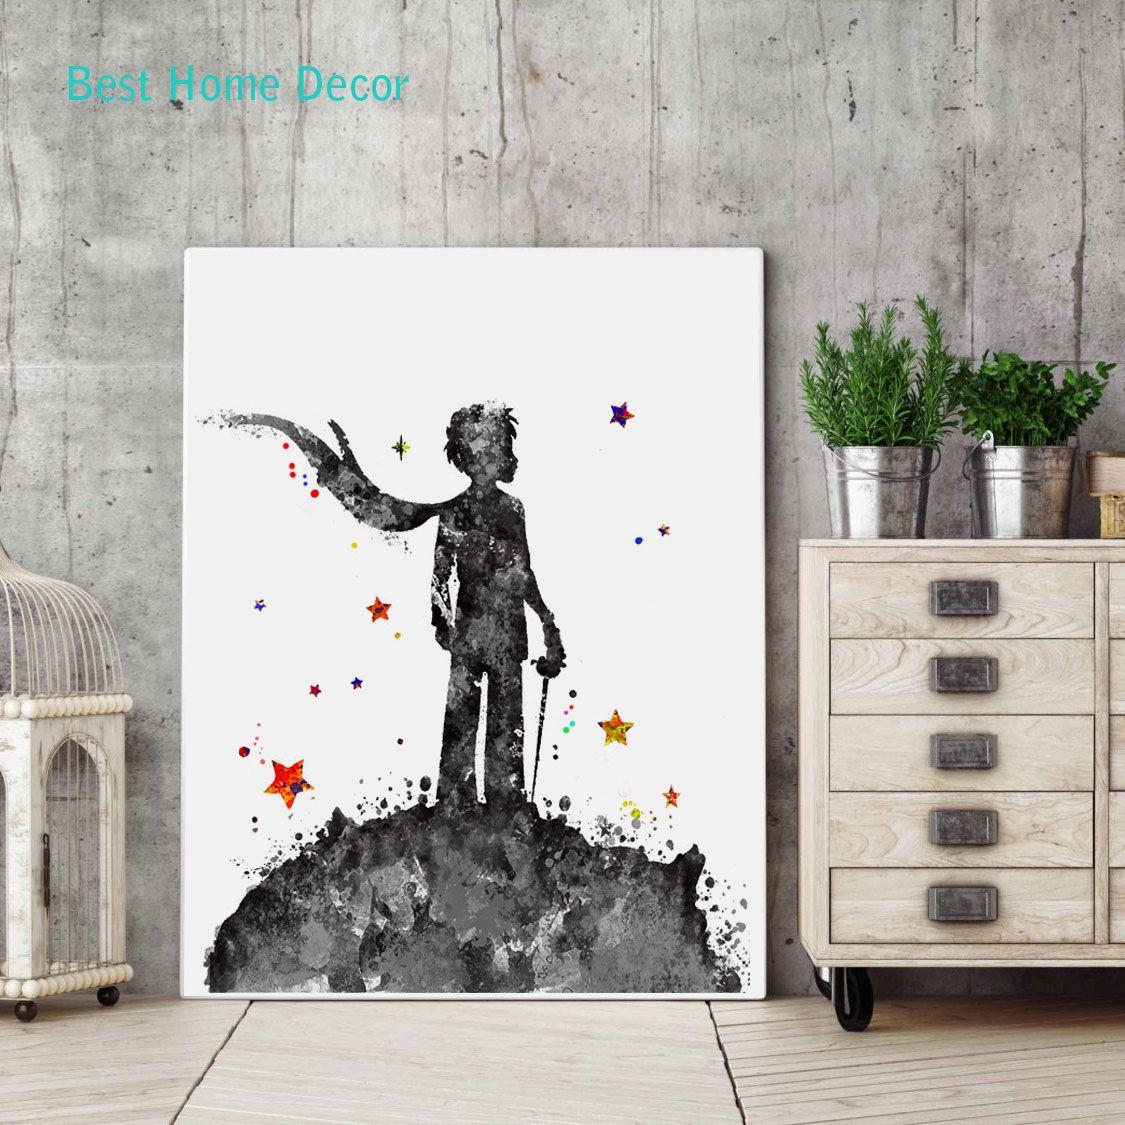 Aliexpress.com : Buy The Little Prince Poster Nursery Fine ...